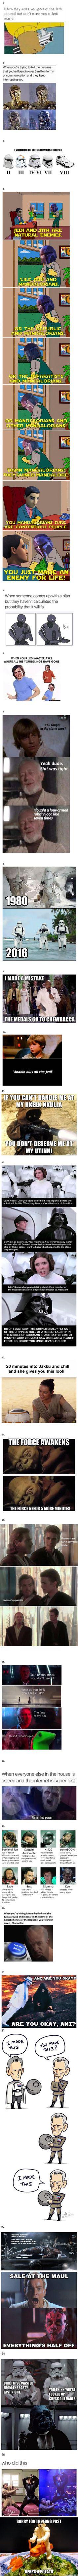 25 Star Wars Memes That Are Danker Than Dagobah